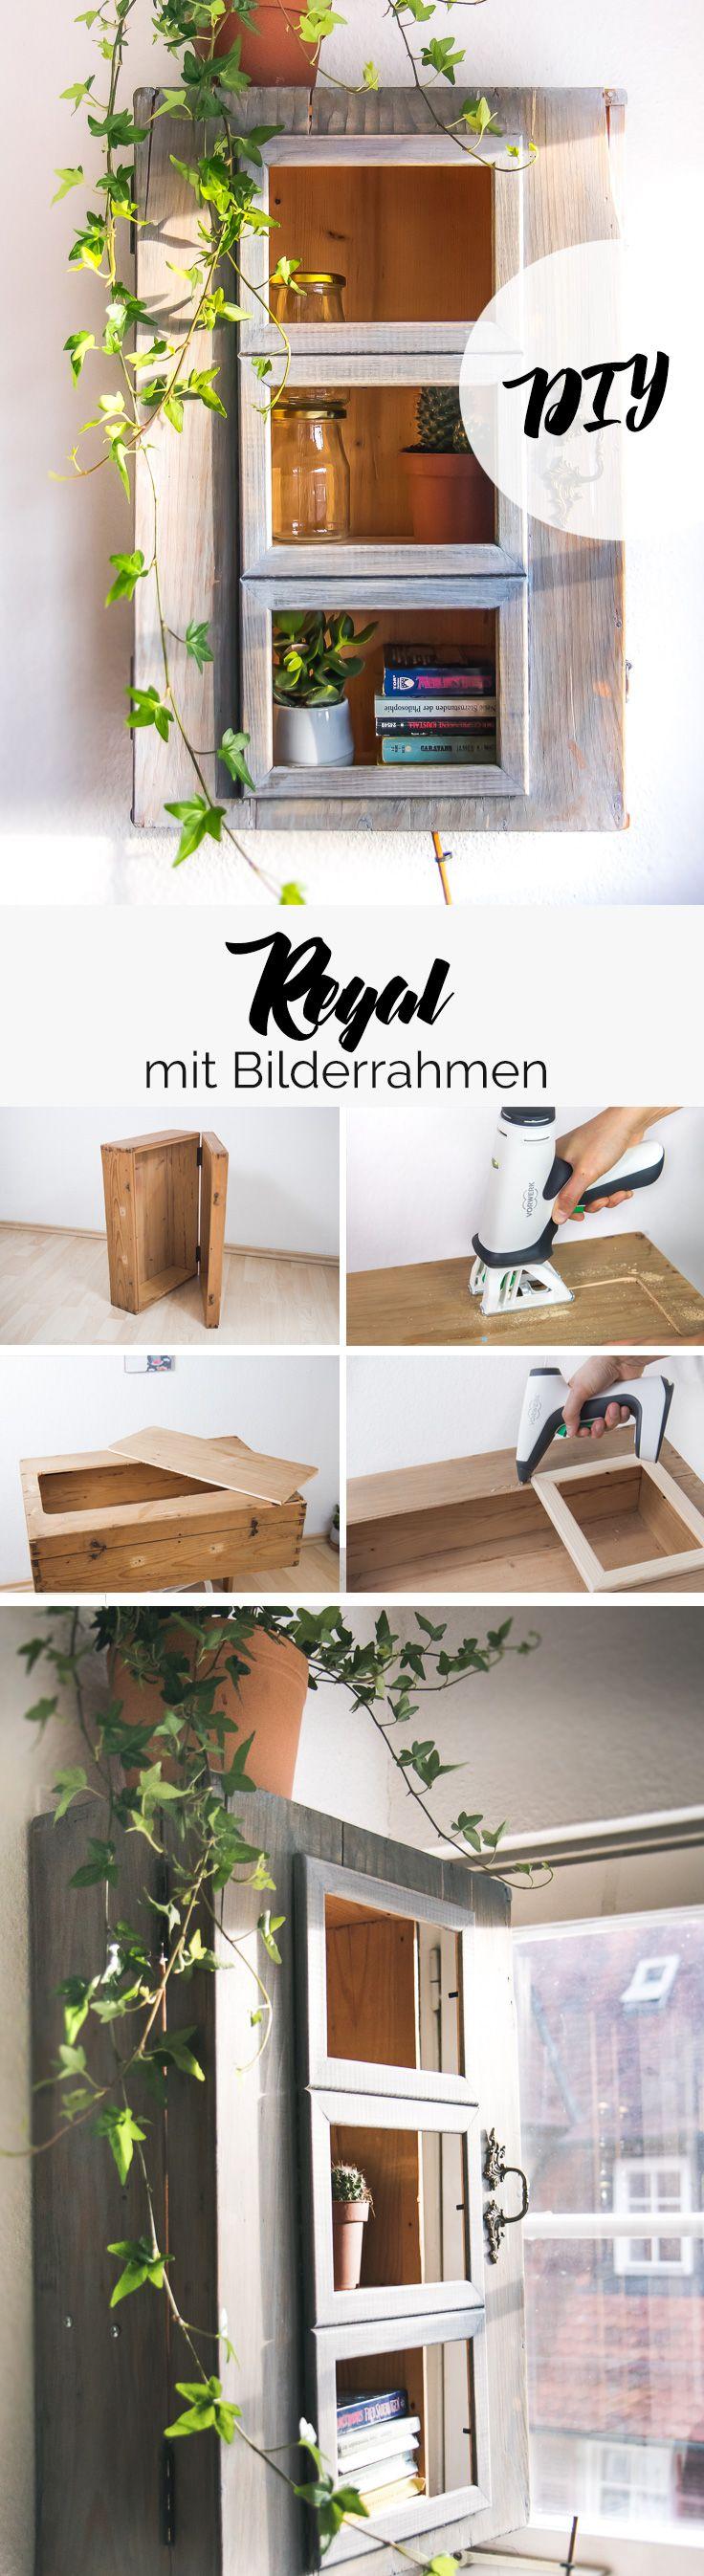 DIY Möbel Idee   Mit Alten Bilderrahmen Kreative Möbel Gestalten. Upcycling  Projekt